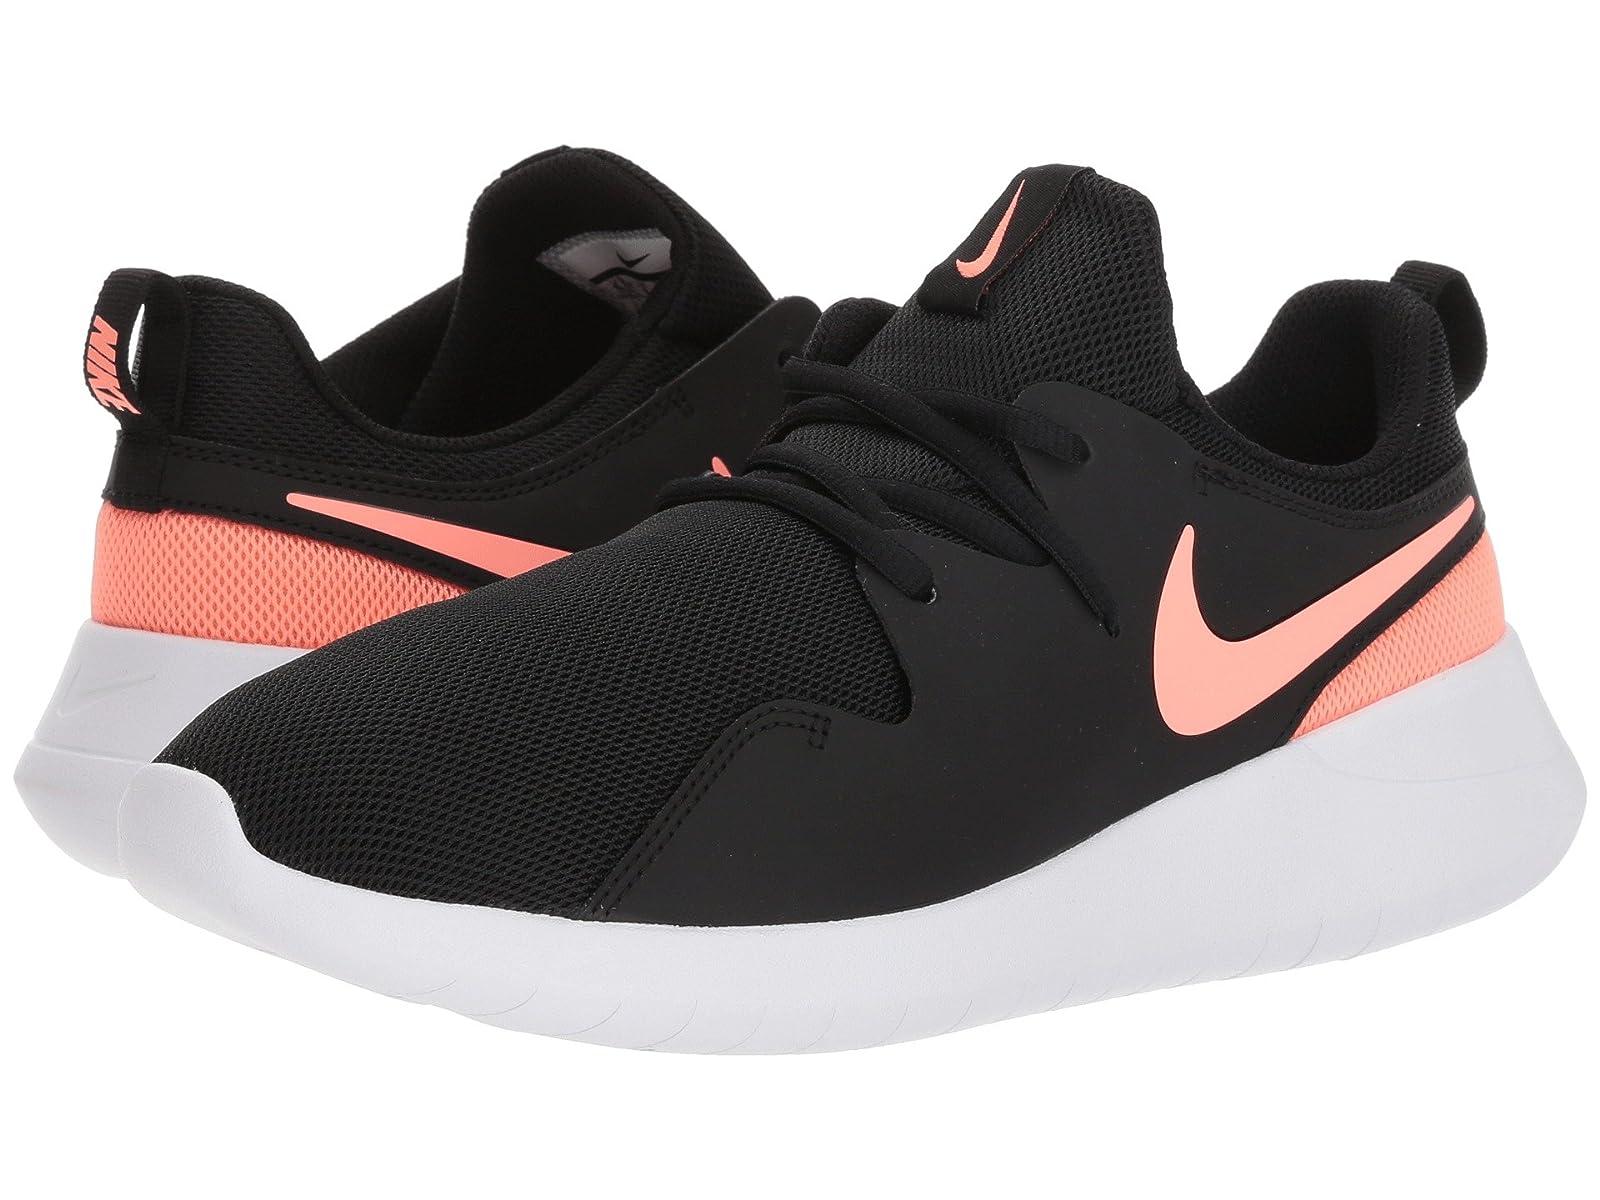 Nike Kids Tessen (Big Kid)Atmospheric grades have affordable shoes